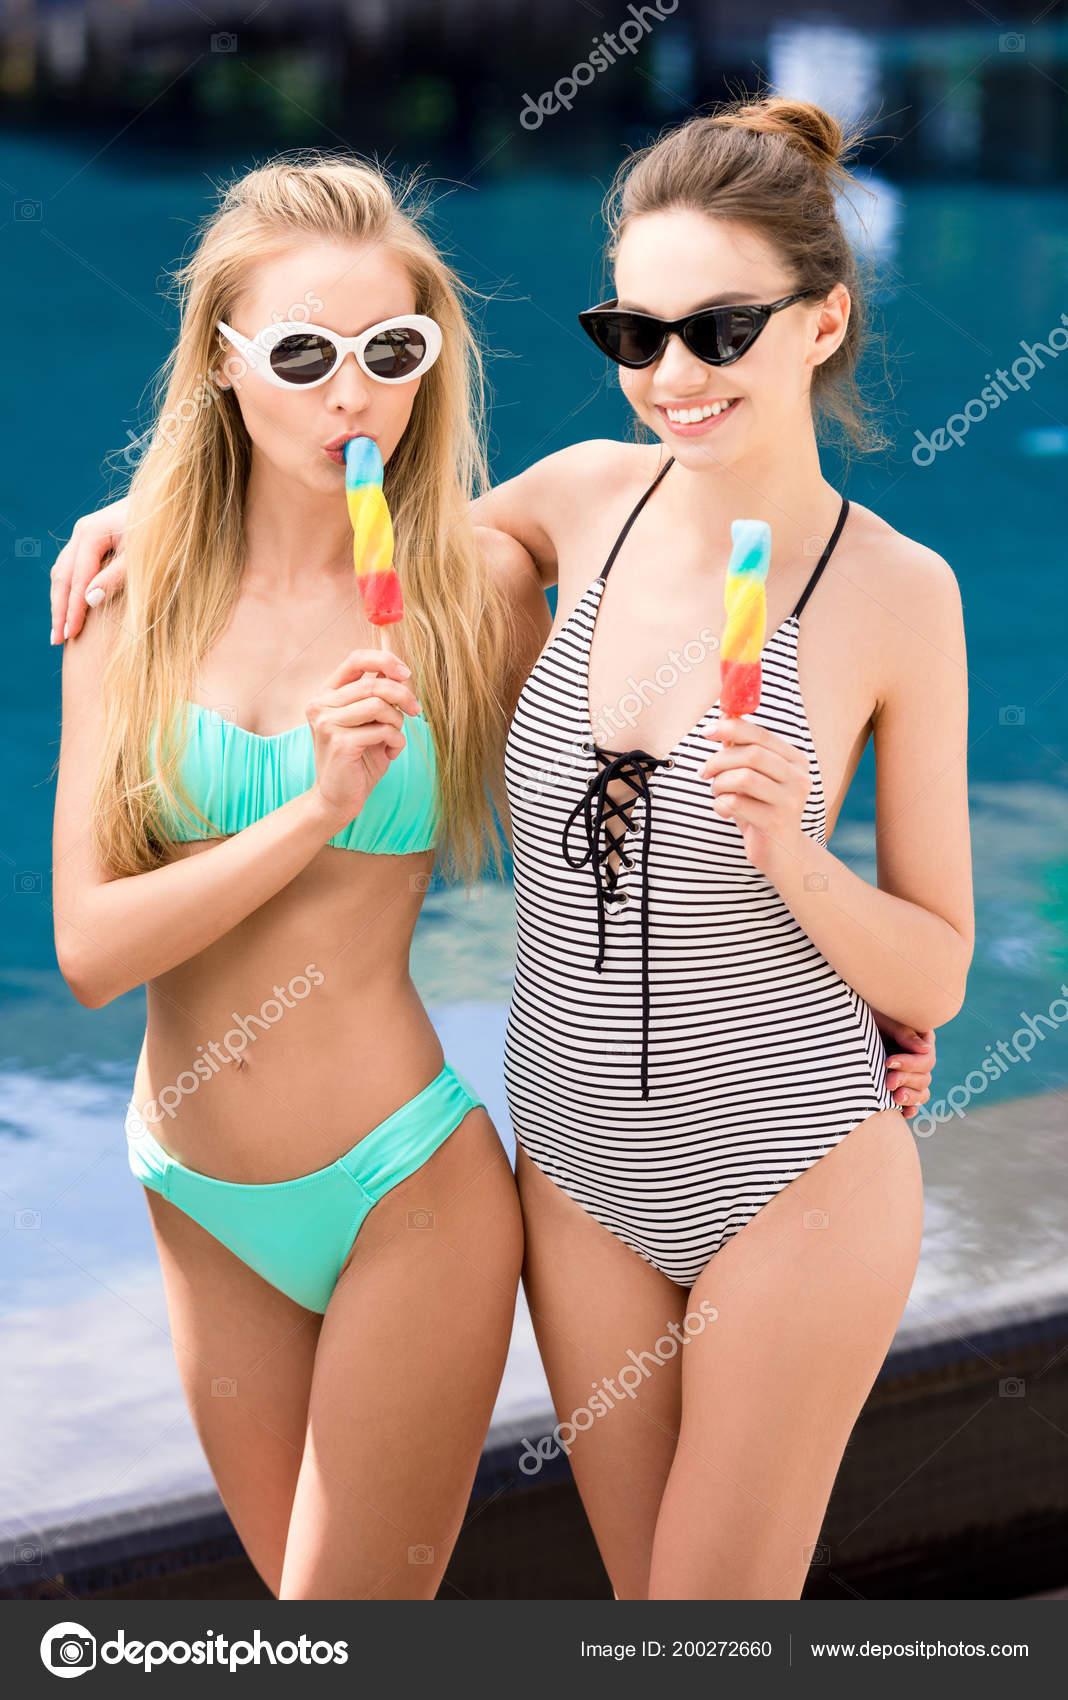 Badpak Bikini.Mooie Jonge Vrouwen Badpak Bikini Ijslolly Eten Bij Zwembad Omarmen